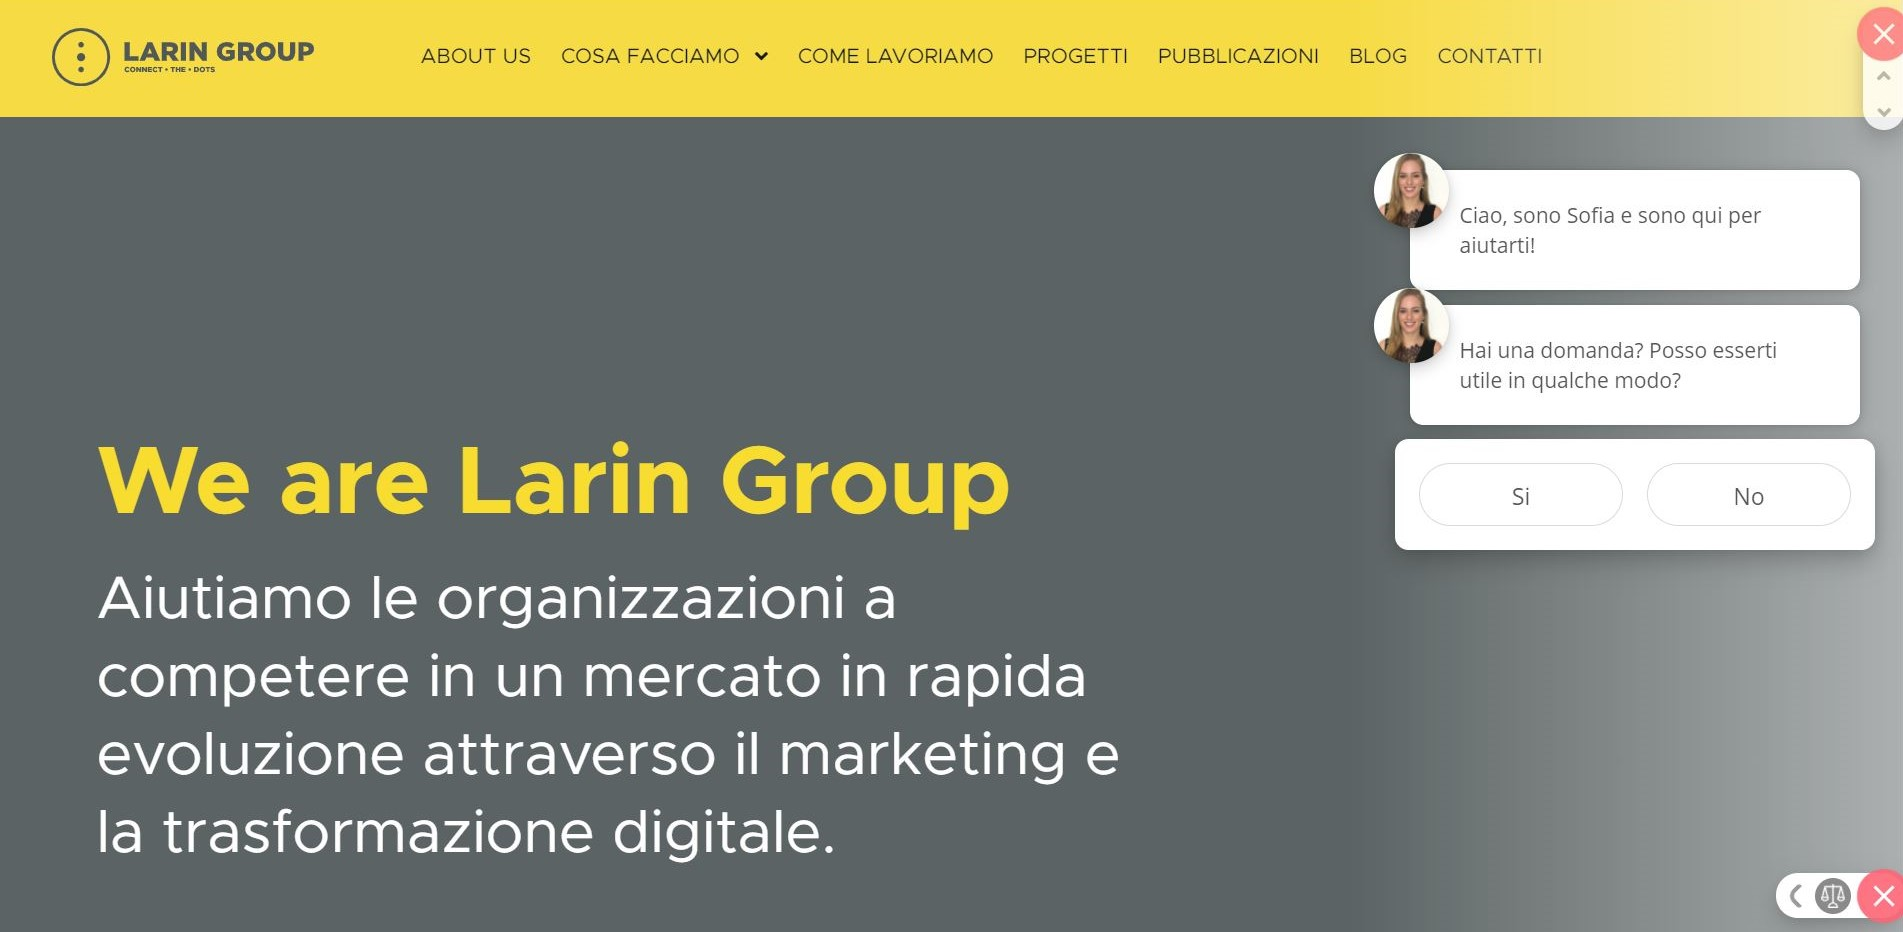 chatbot marketing sito web di Larin Group